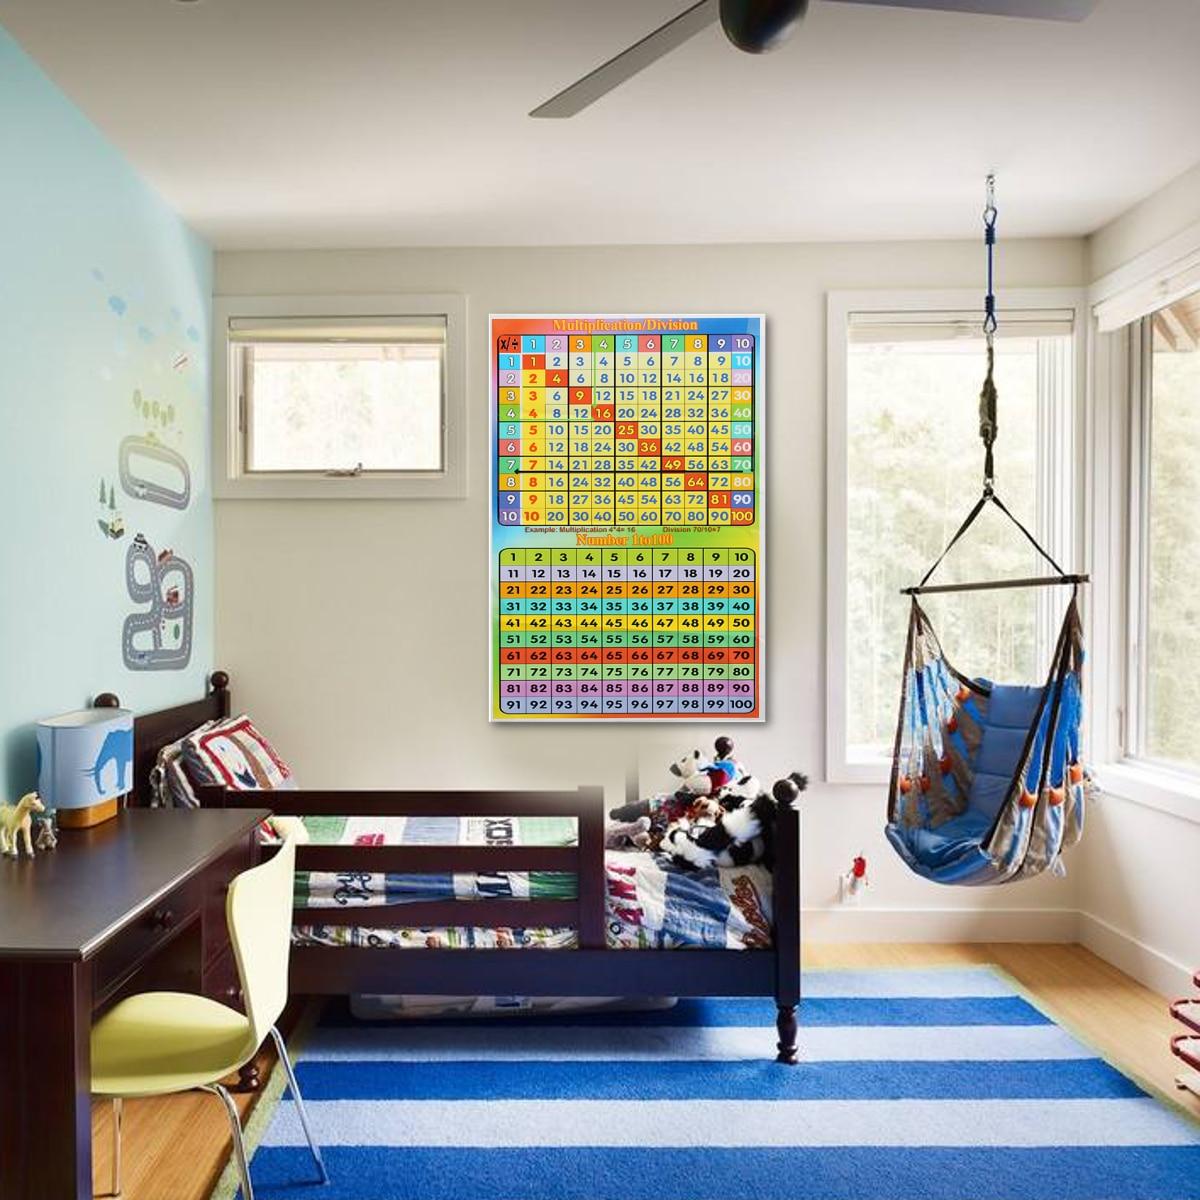 58x39.5cm 1-100 Number Educational Kids Poster Bedroom Livingroom Wall Hanging Multiplication / Division Alphabet Poster Decor